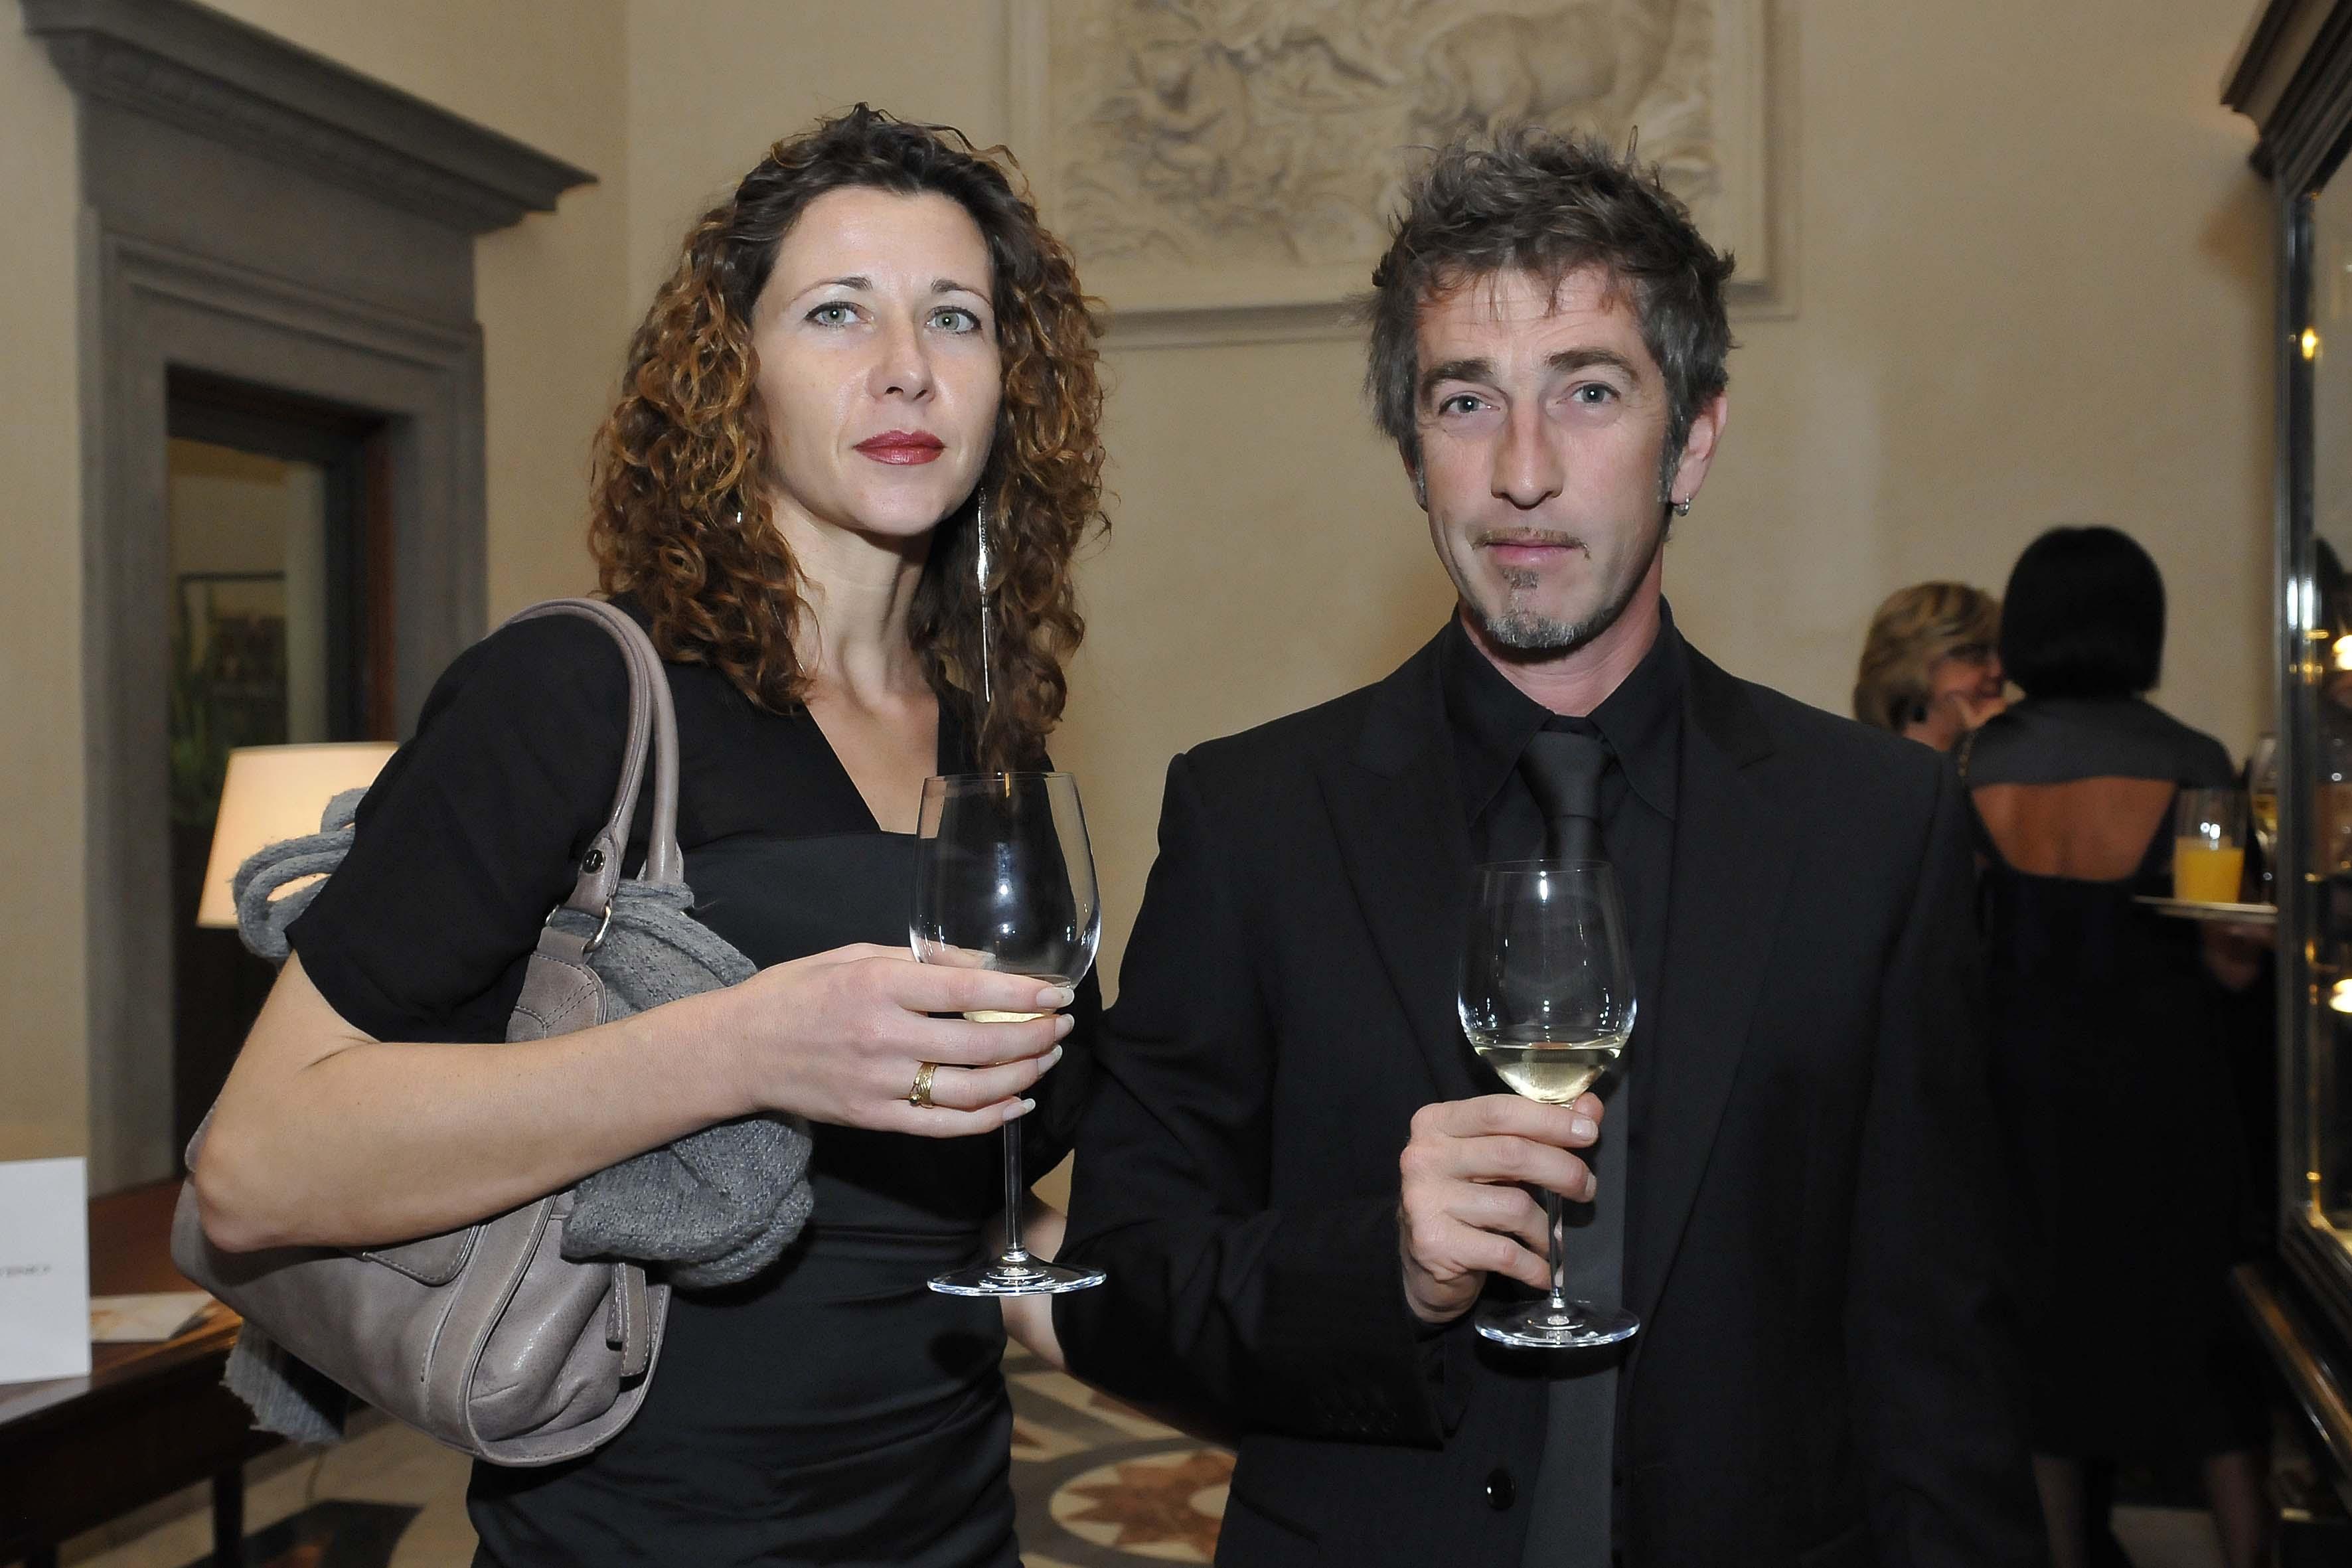 Saverio Marilli, Renata Pisciscelli